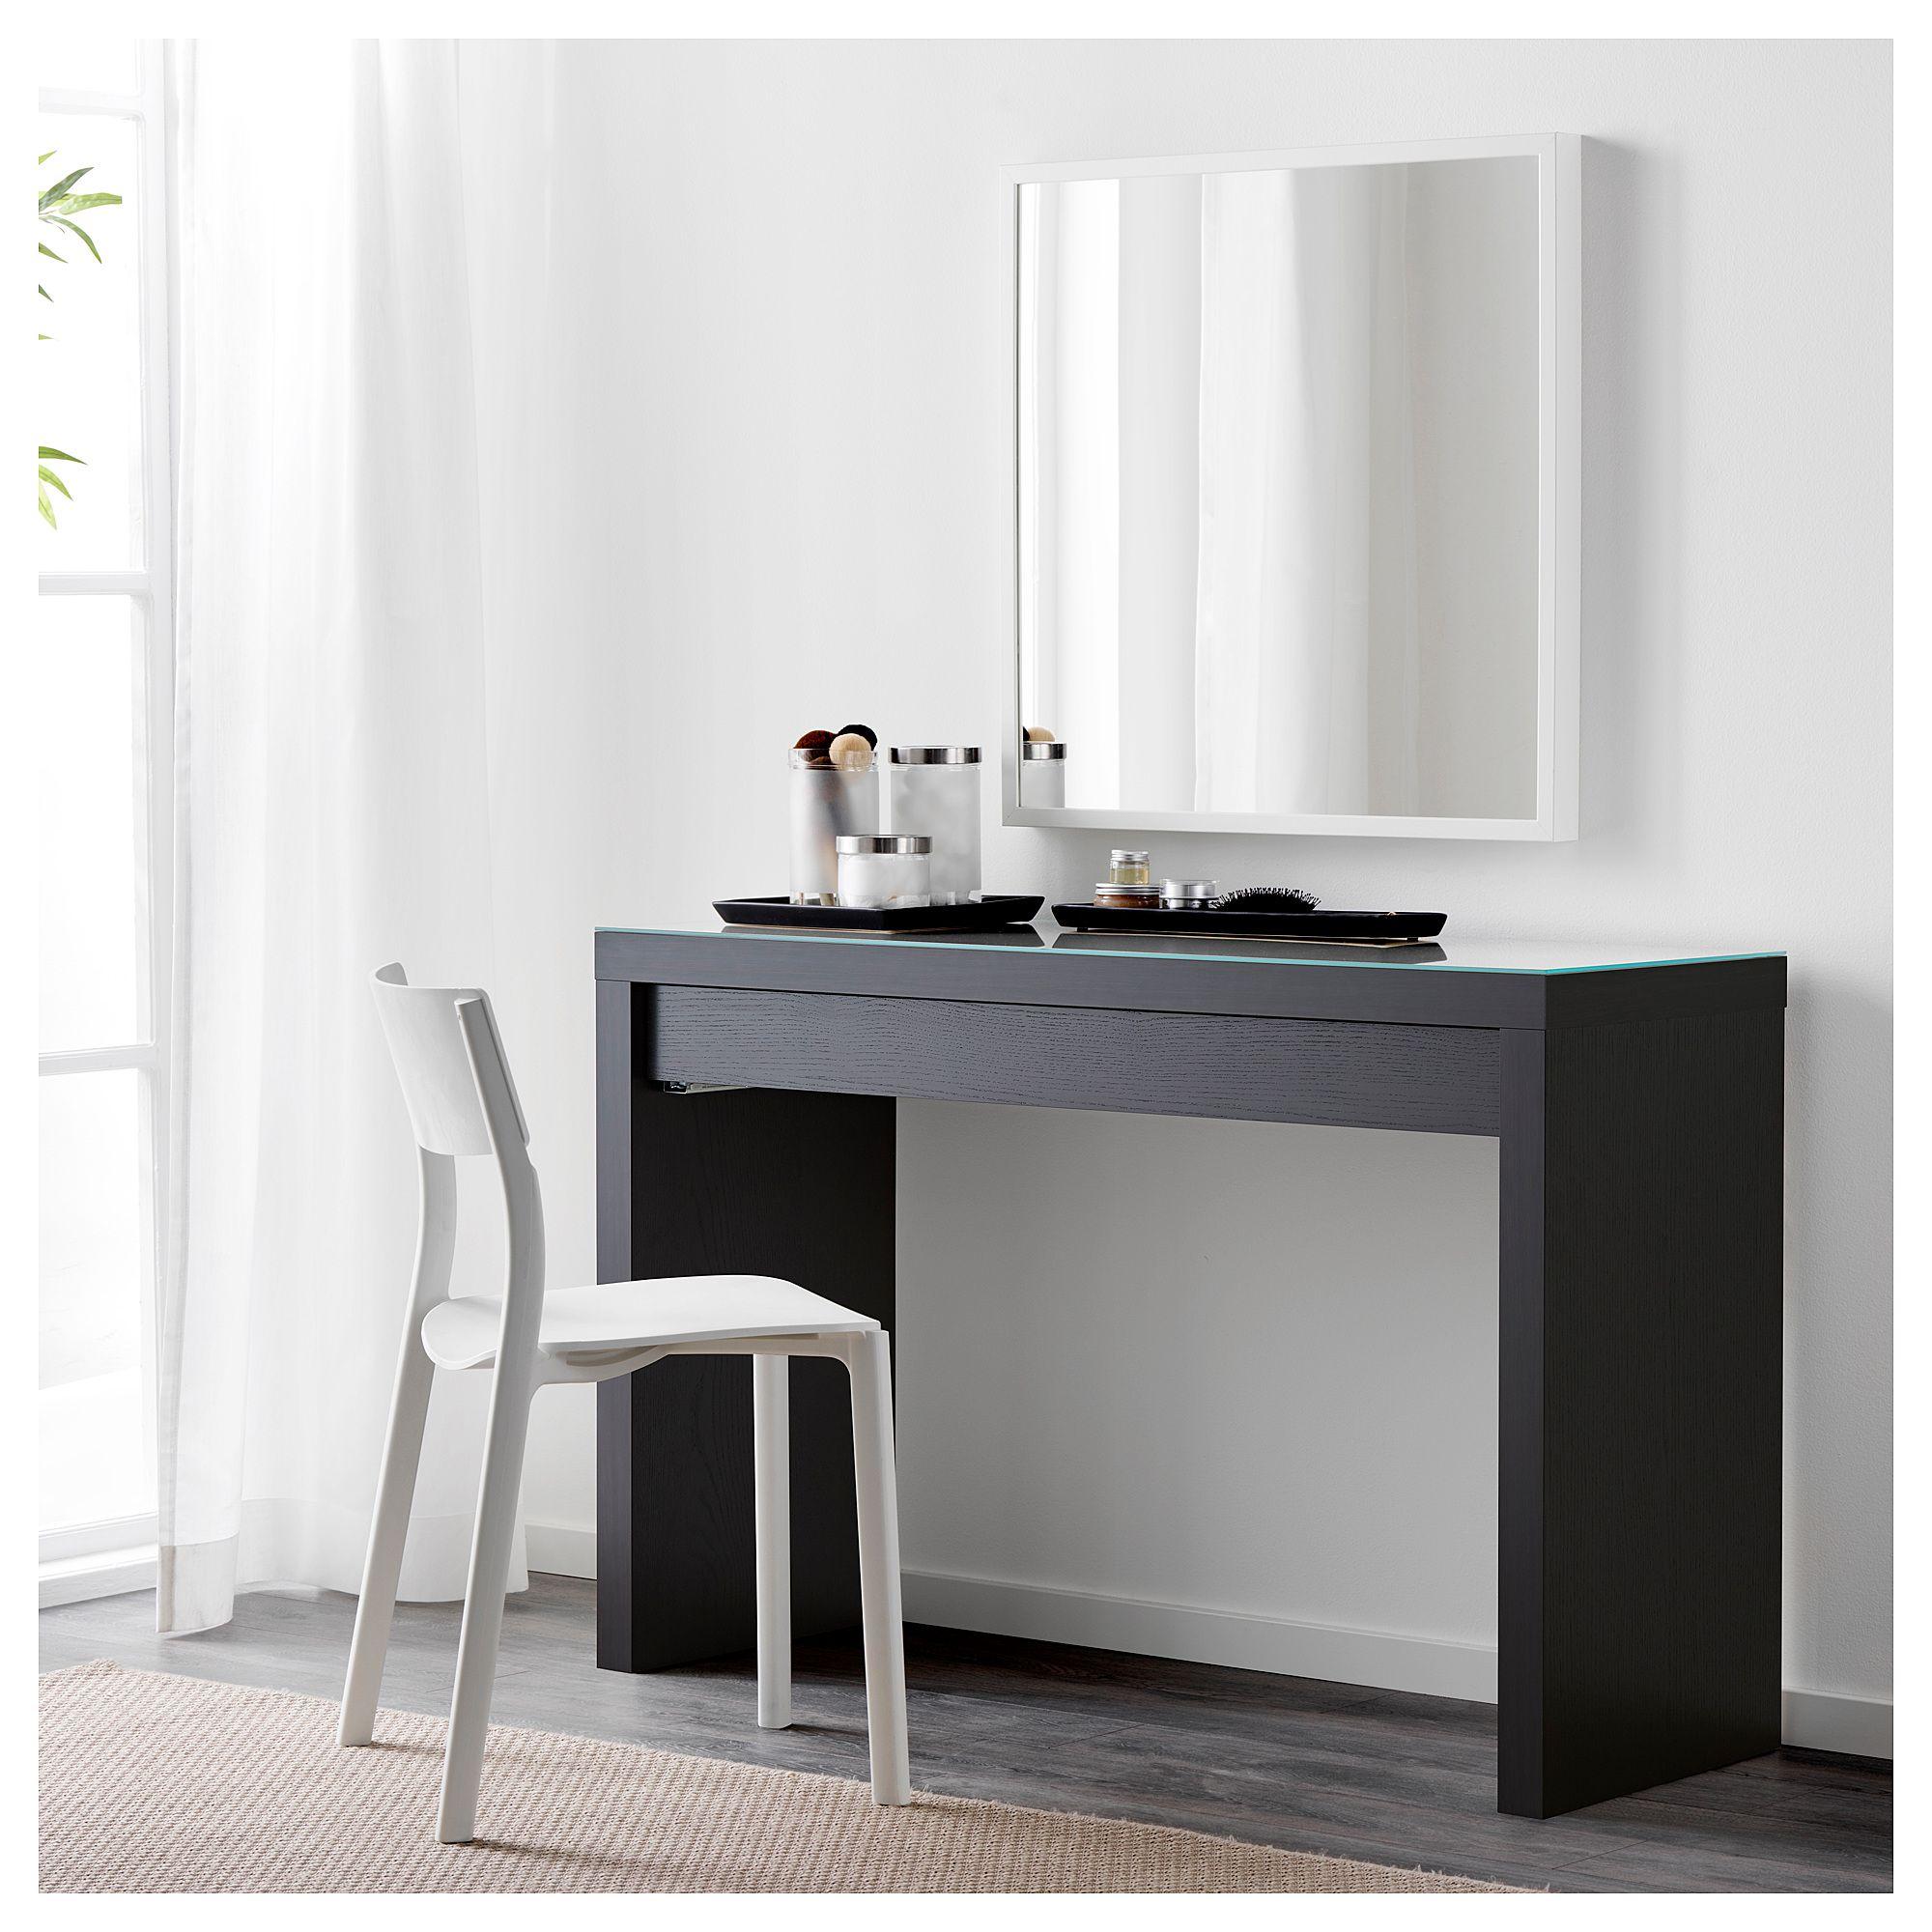 Malm Dressing Table Black Brown 47 1 4x16 1 8 120x41 Cm